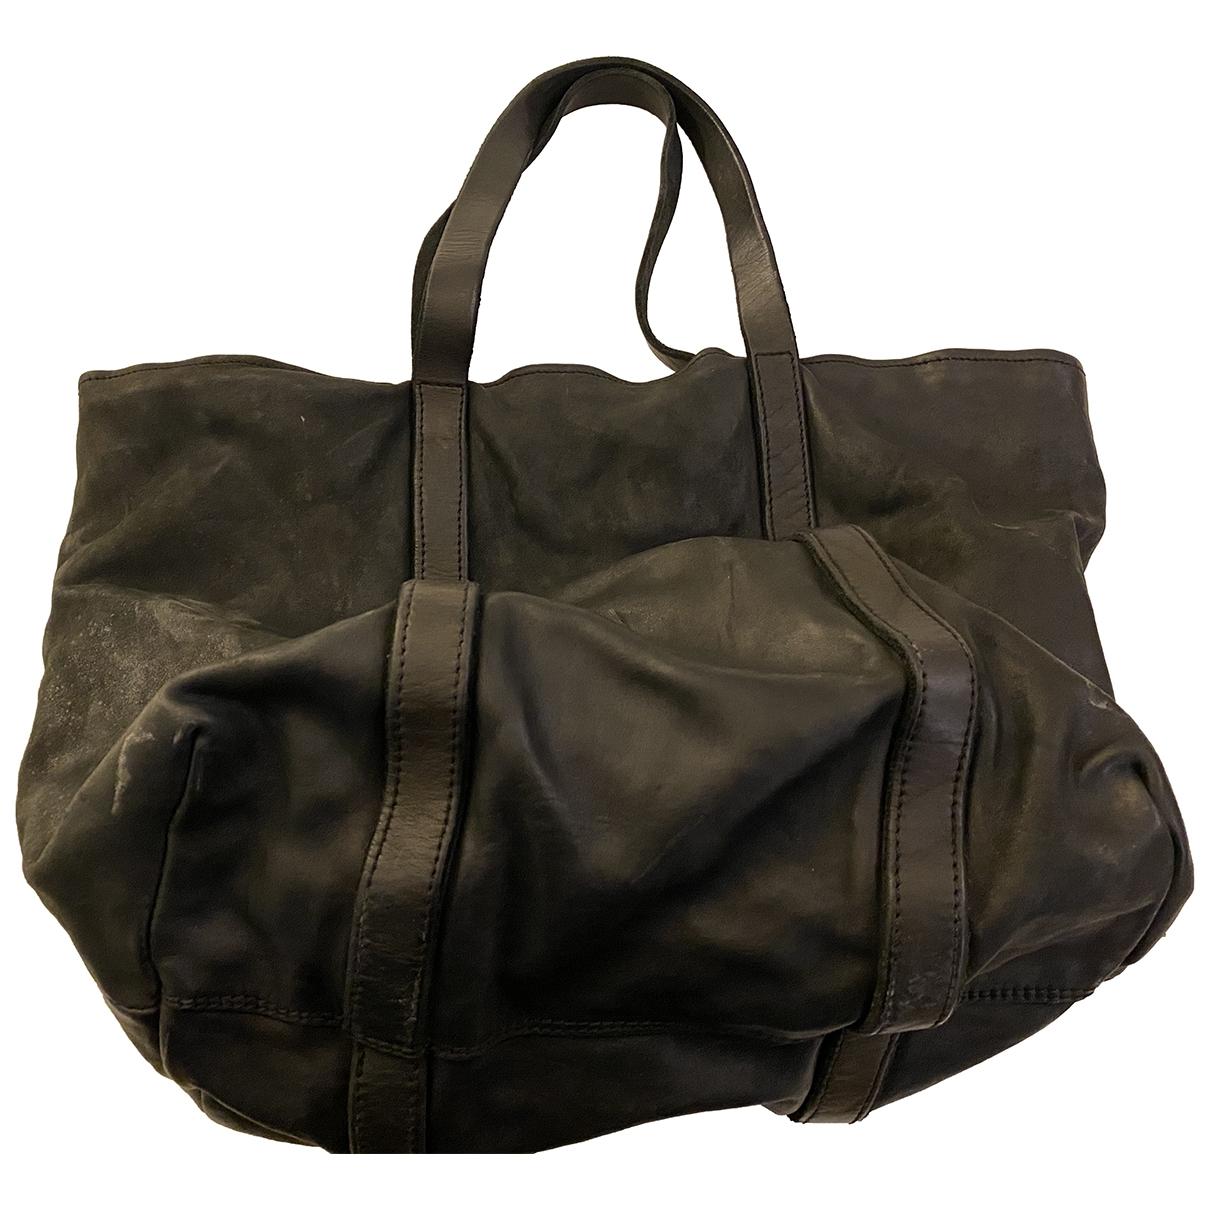 Guidi \N Black Leather handbag for Women \N